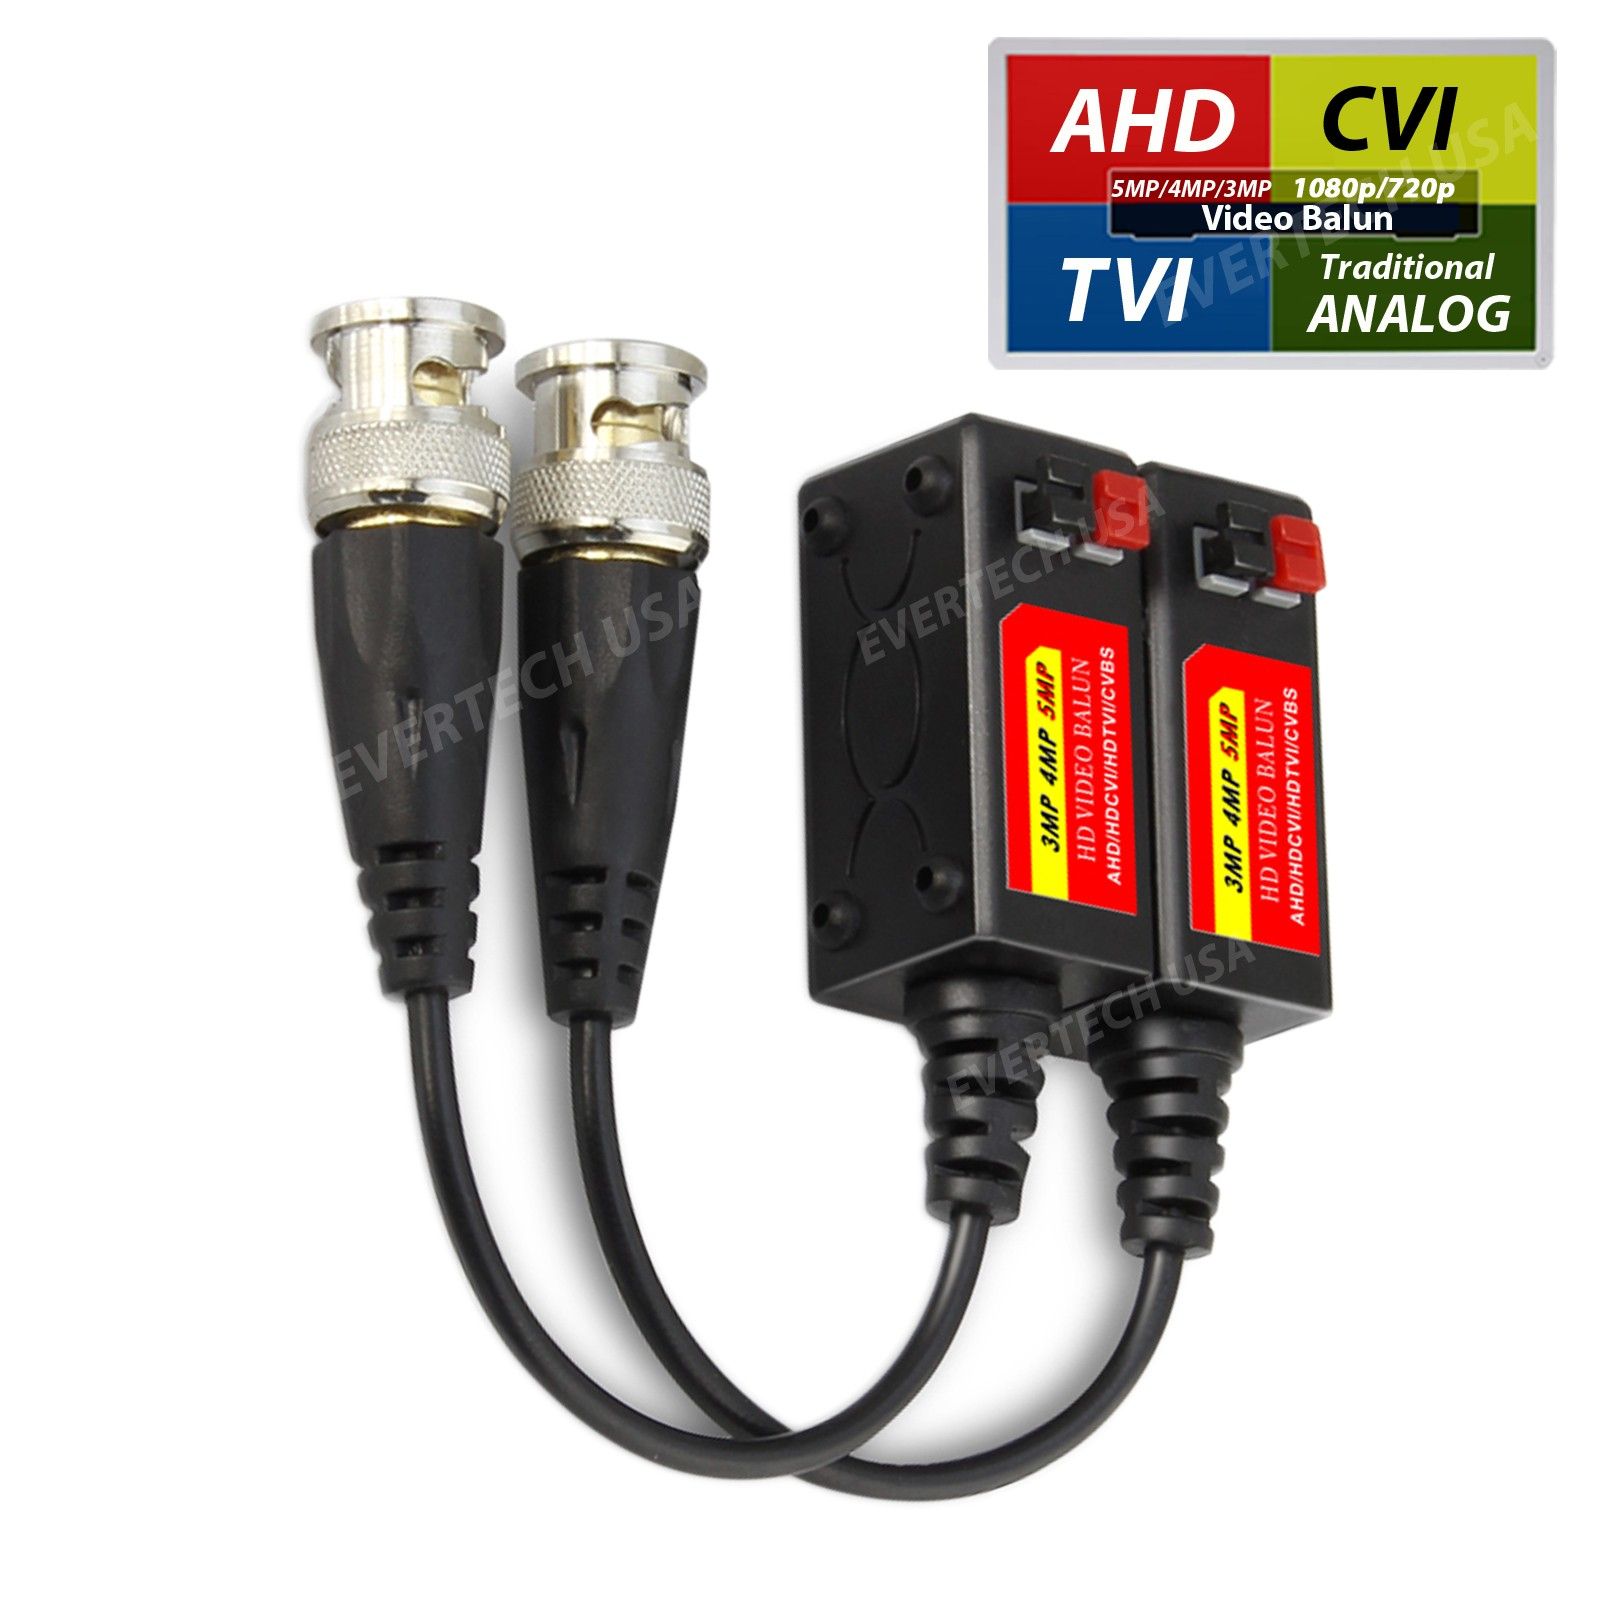 32 pcs 16 Pairs CCTV Passive HD Video Balun Transceiver Analog,CVI,TVI AHD